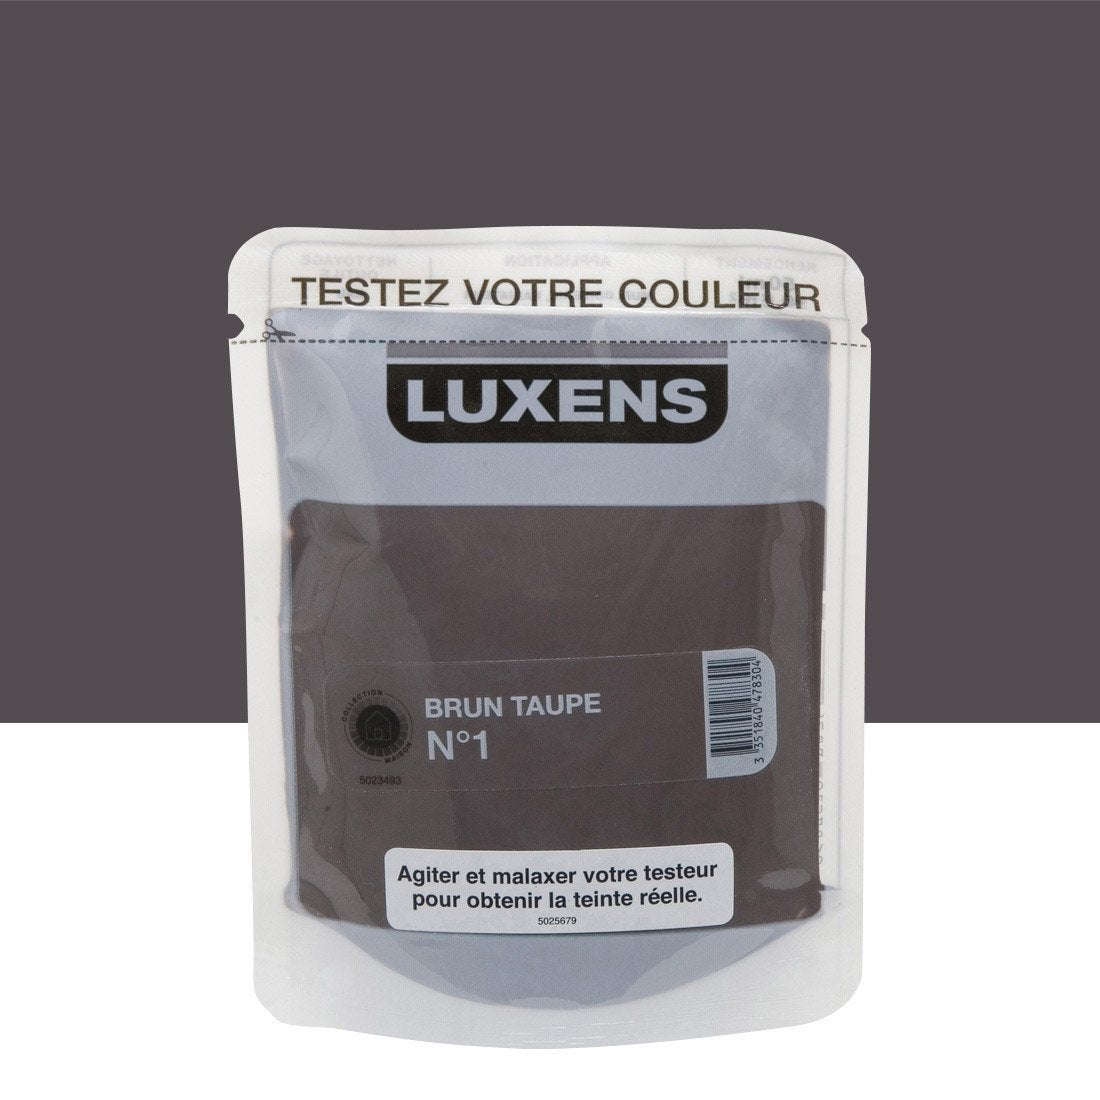 testeur peinture brun taupe 1 luxens couleurs int rieures satin l leroy merlin. Black Bedroom Furniture Sets. Home Design Ideas